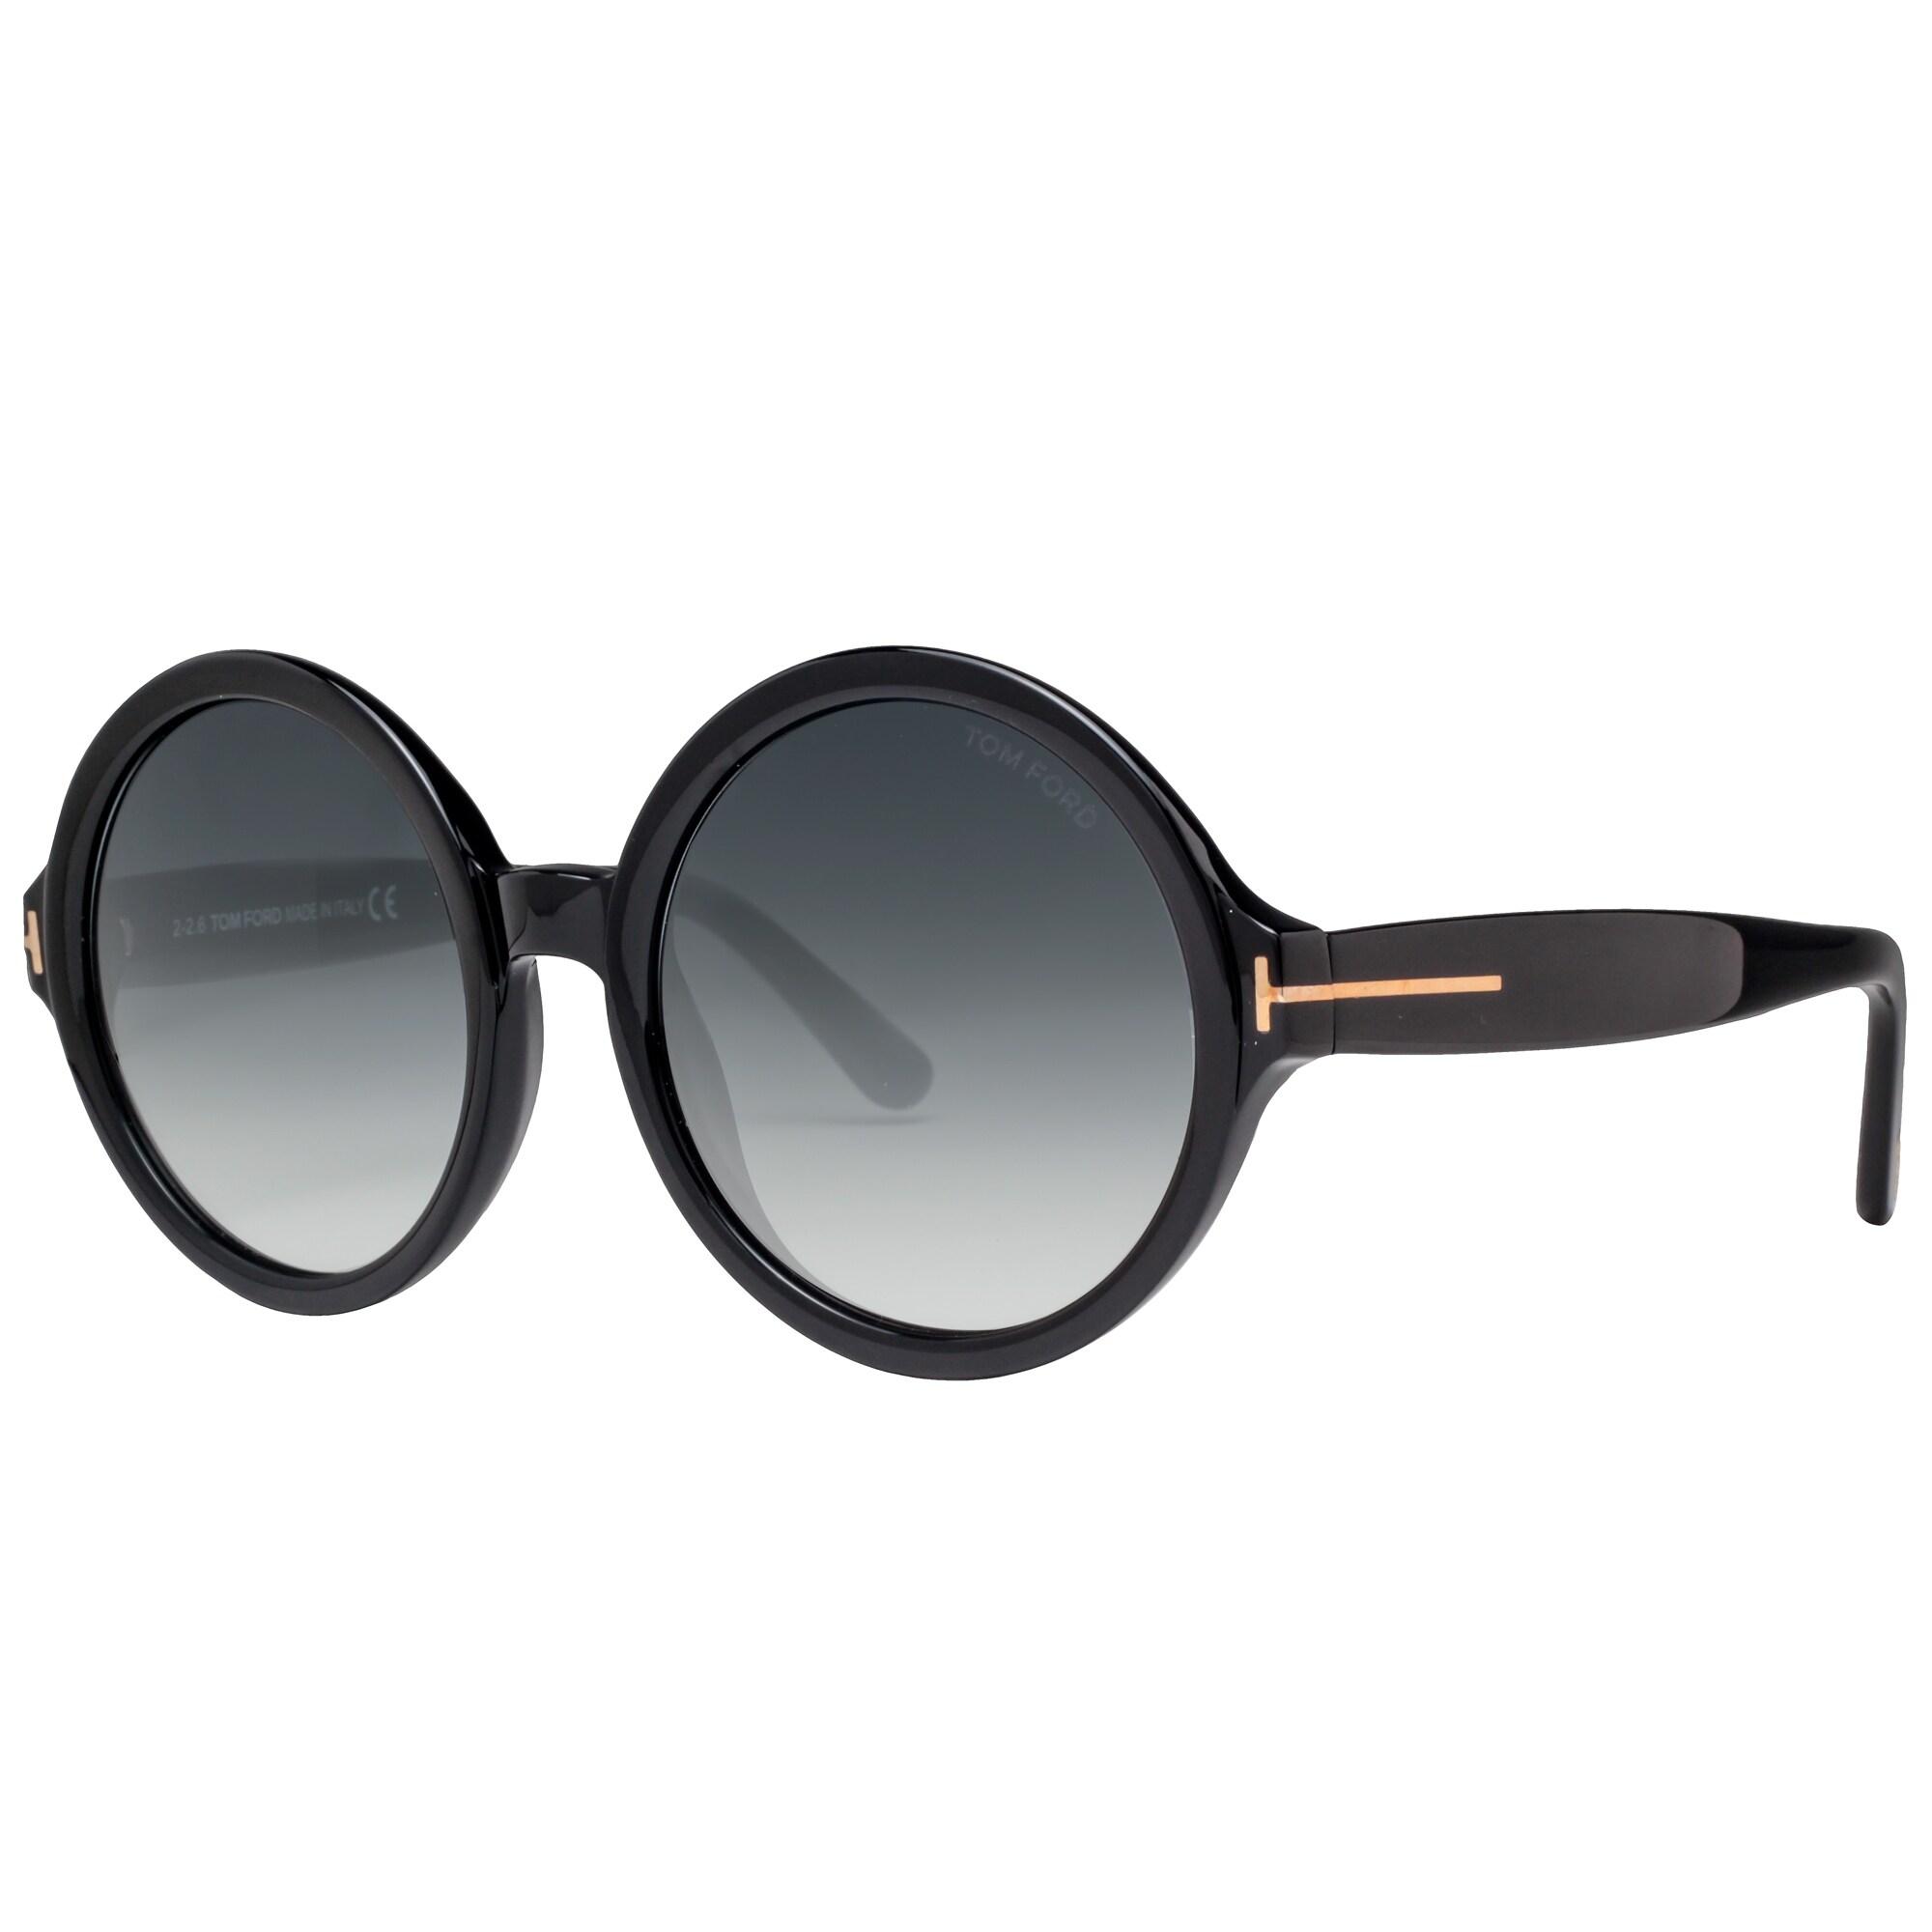 Tom Ford Round frame sunglasses m6TMO6bNaa